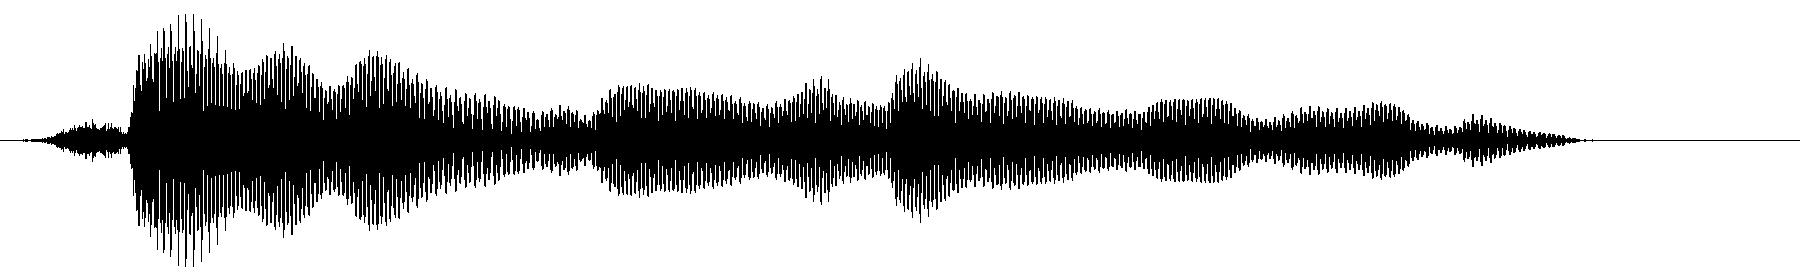 alvinbary 07